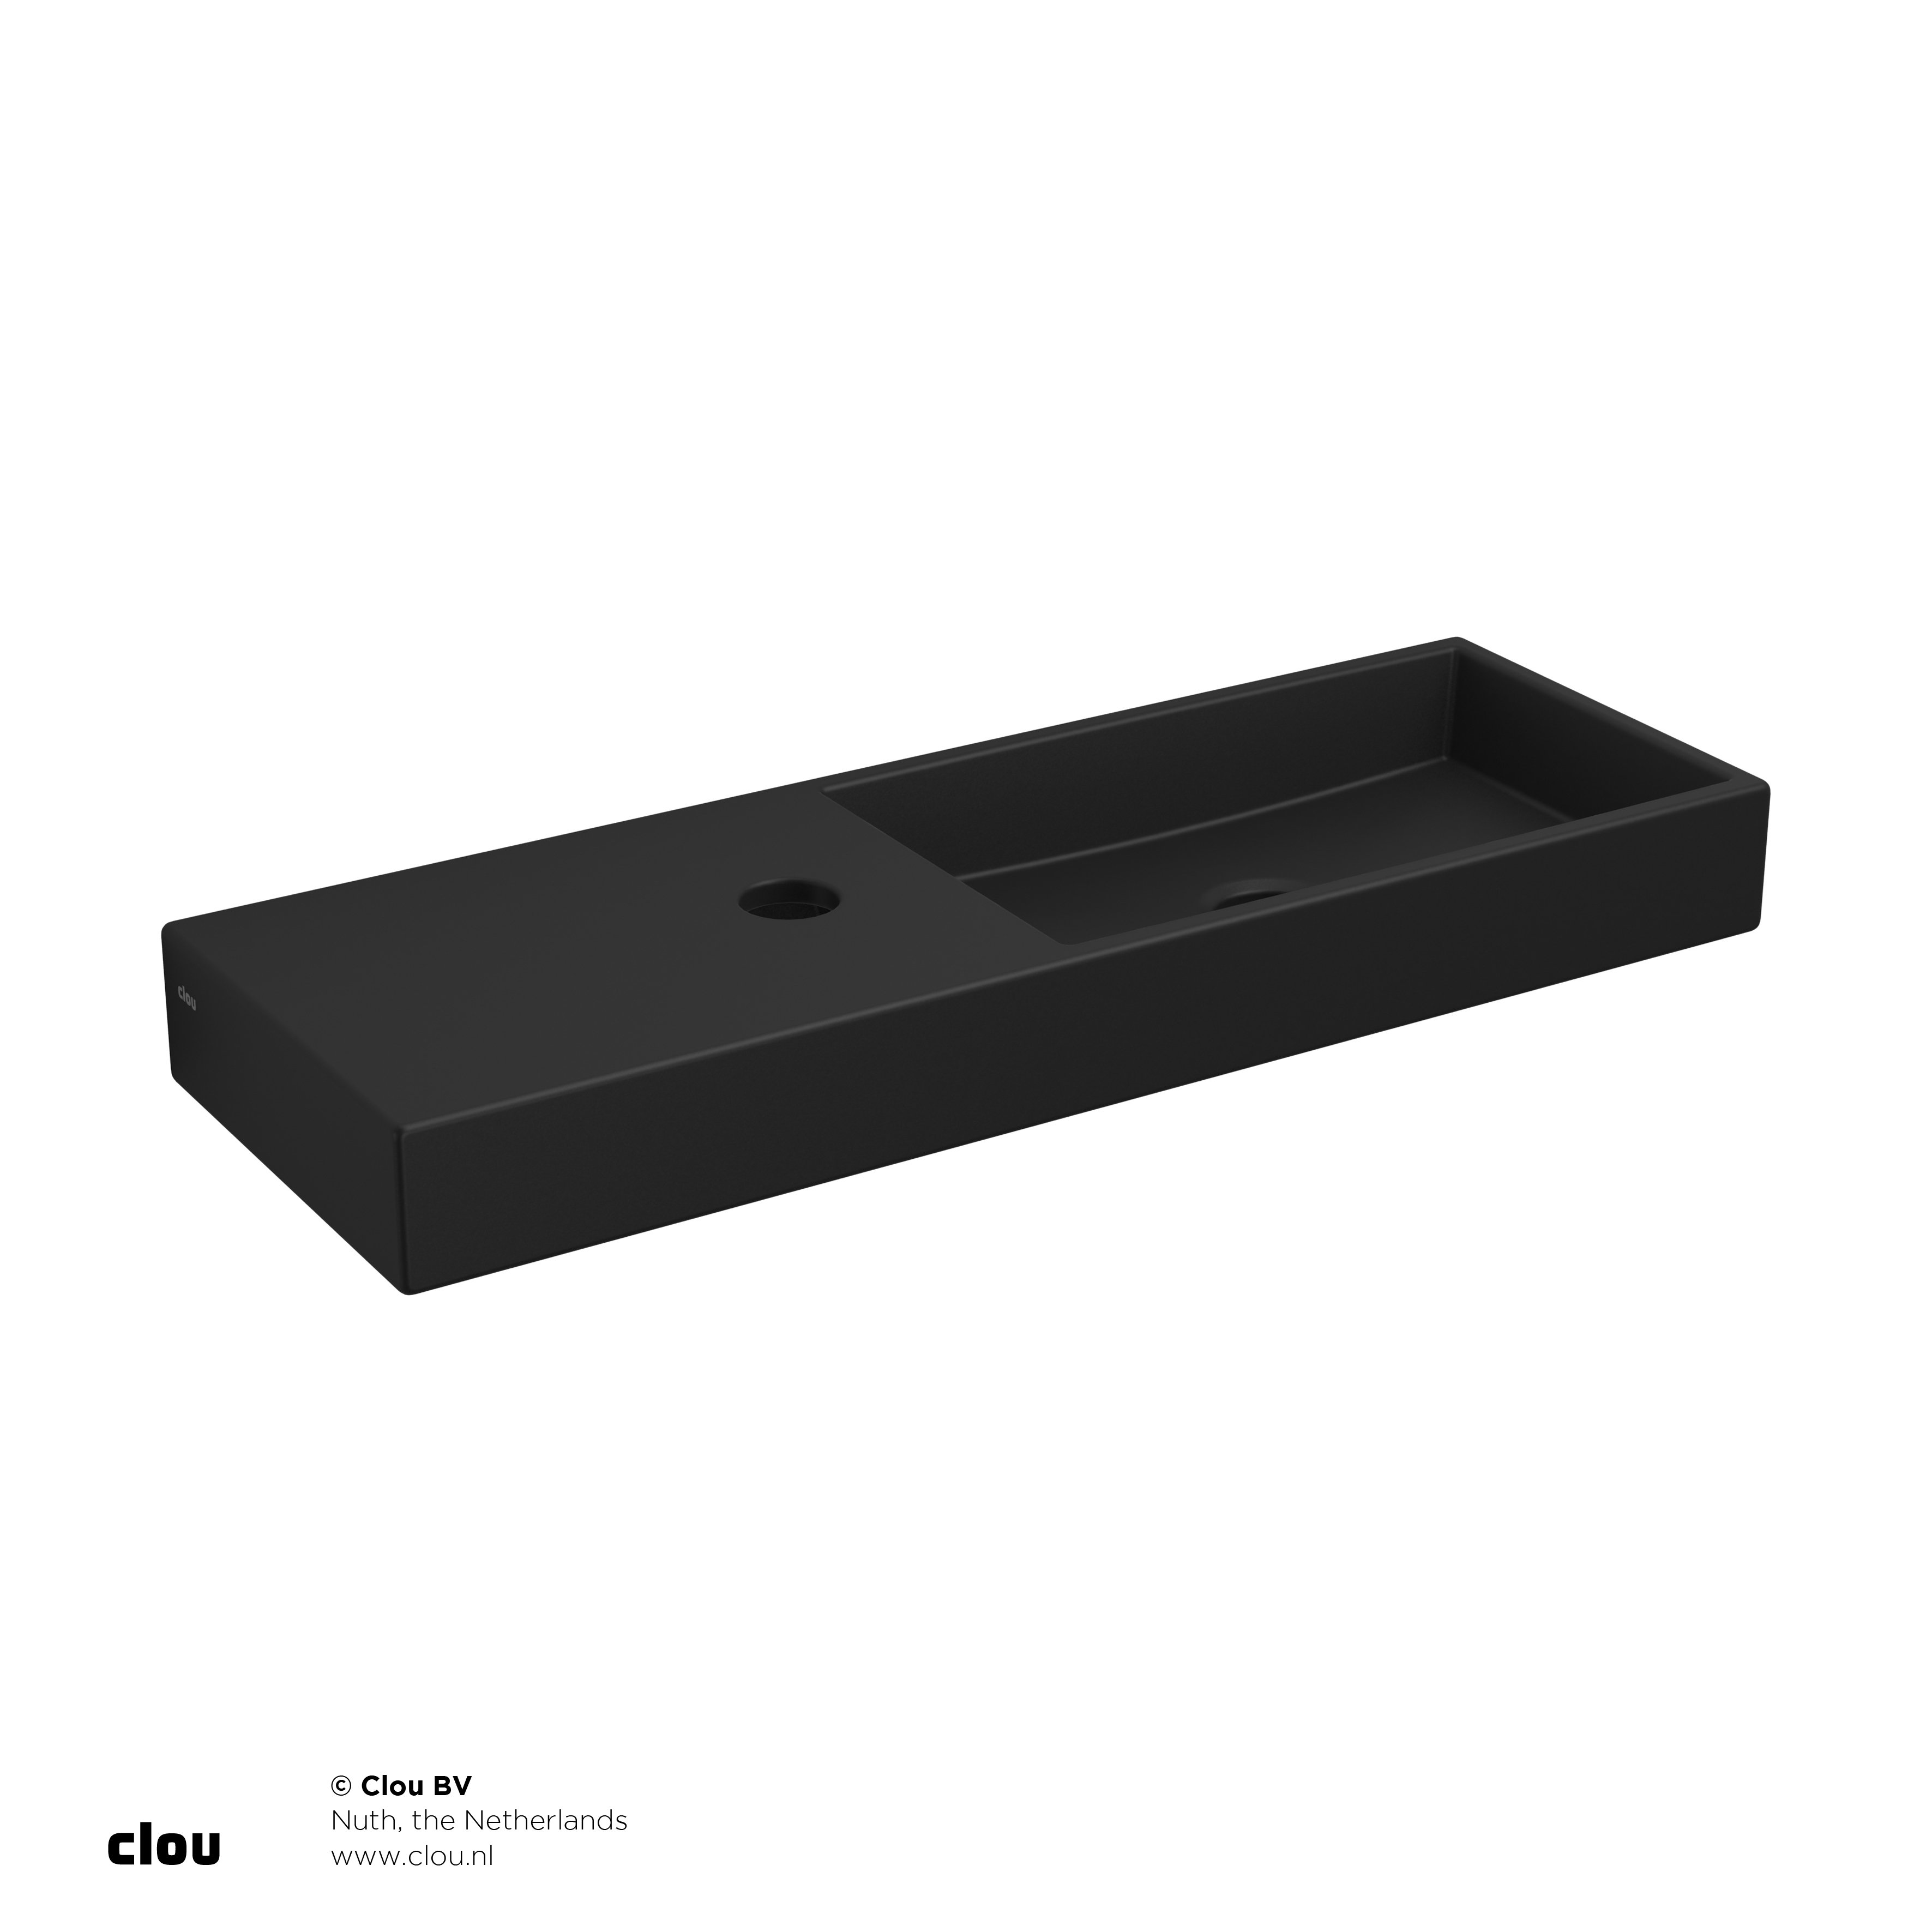 Clou Mini Wash Me fontein 56cm, met kraangat links, mat zwart